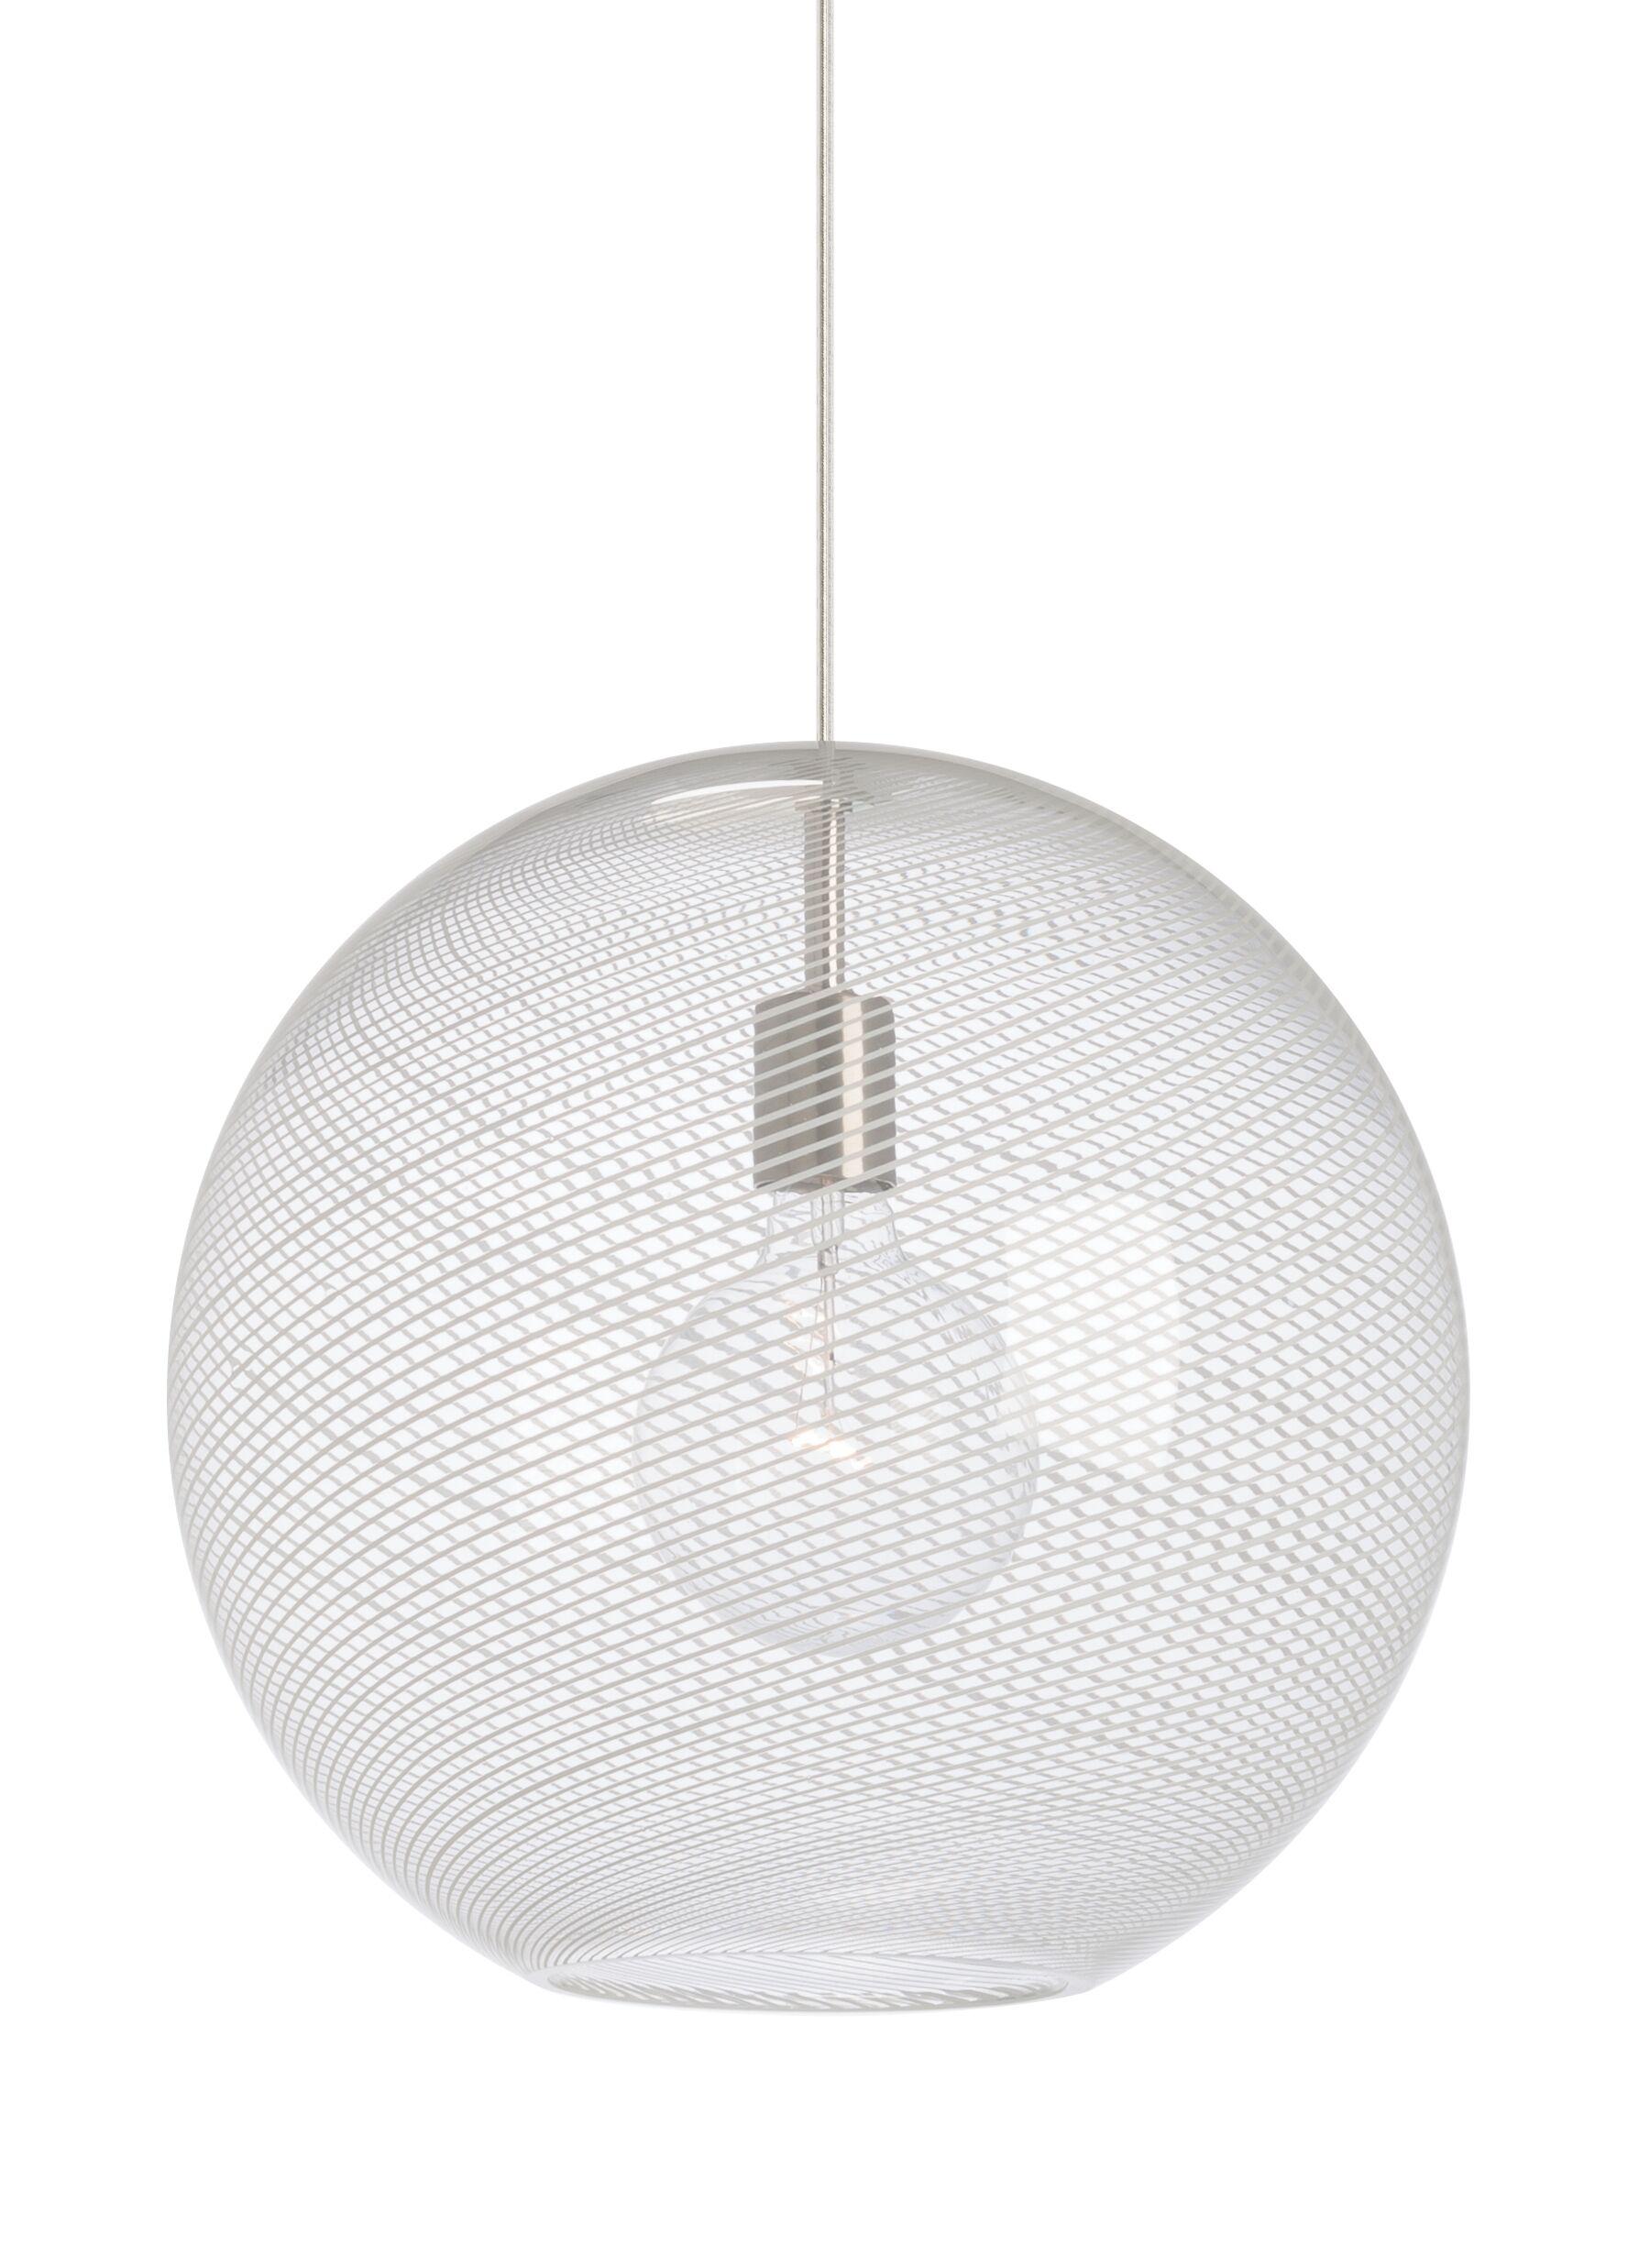 1-Light Pendant Bulb Type: Incandescent